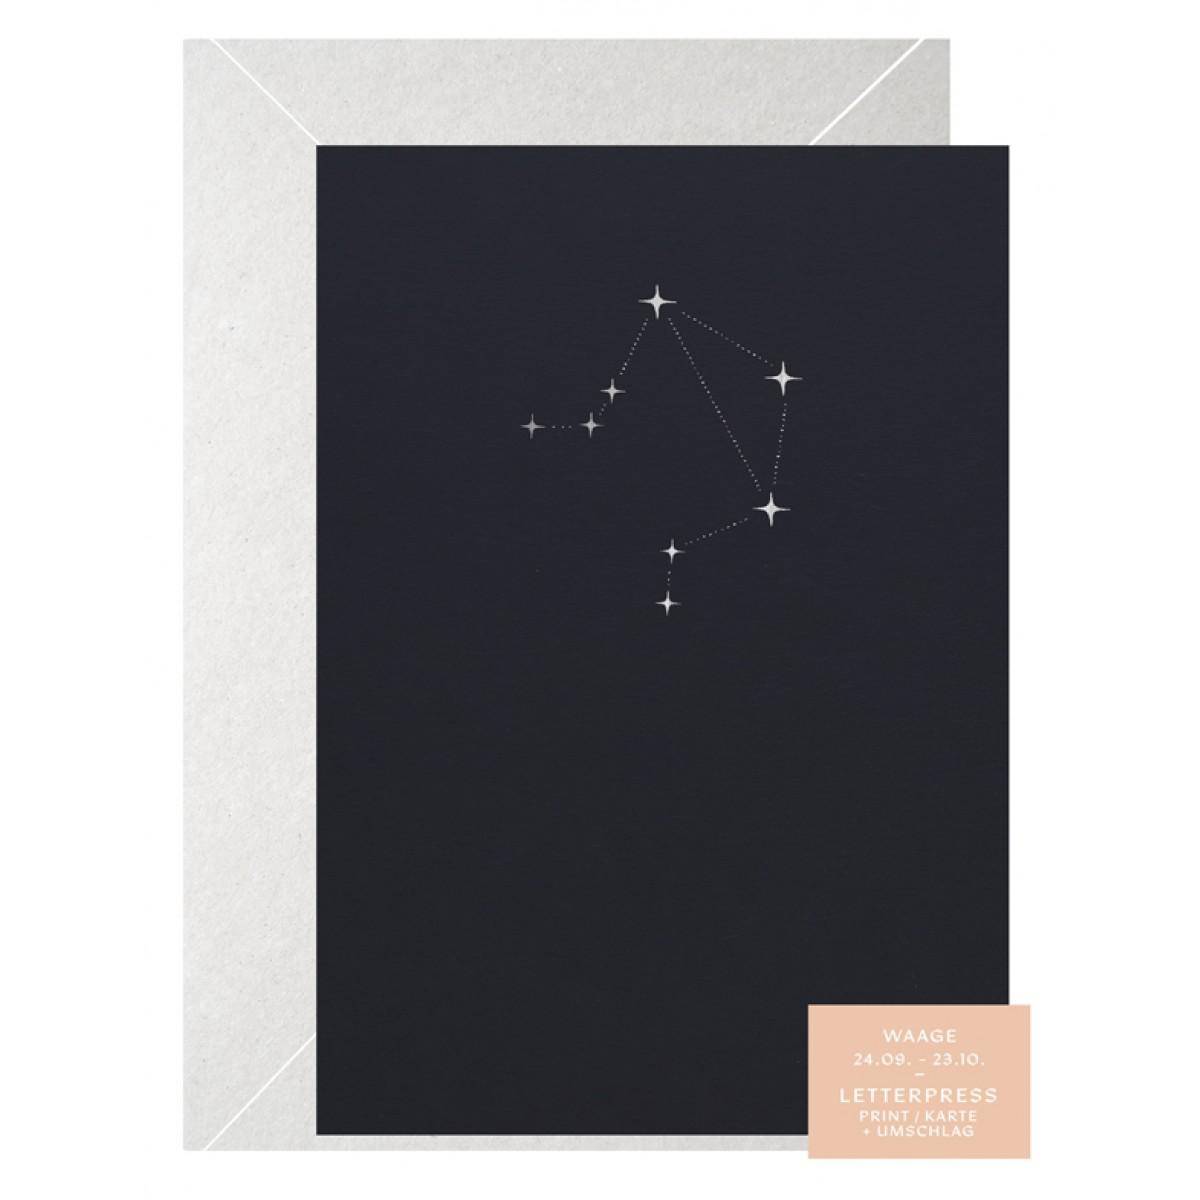 WAAGE STERNZEICHEN - A5 Print - Letterpress – Anna Cosma